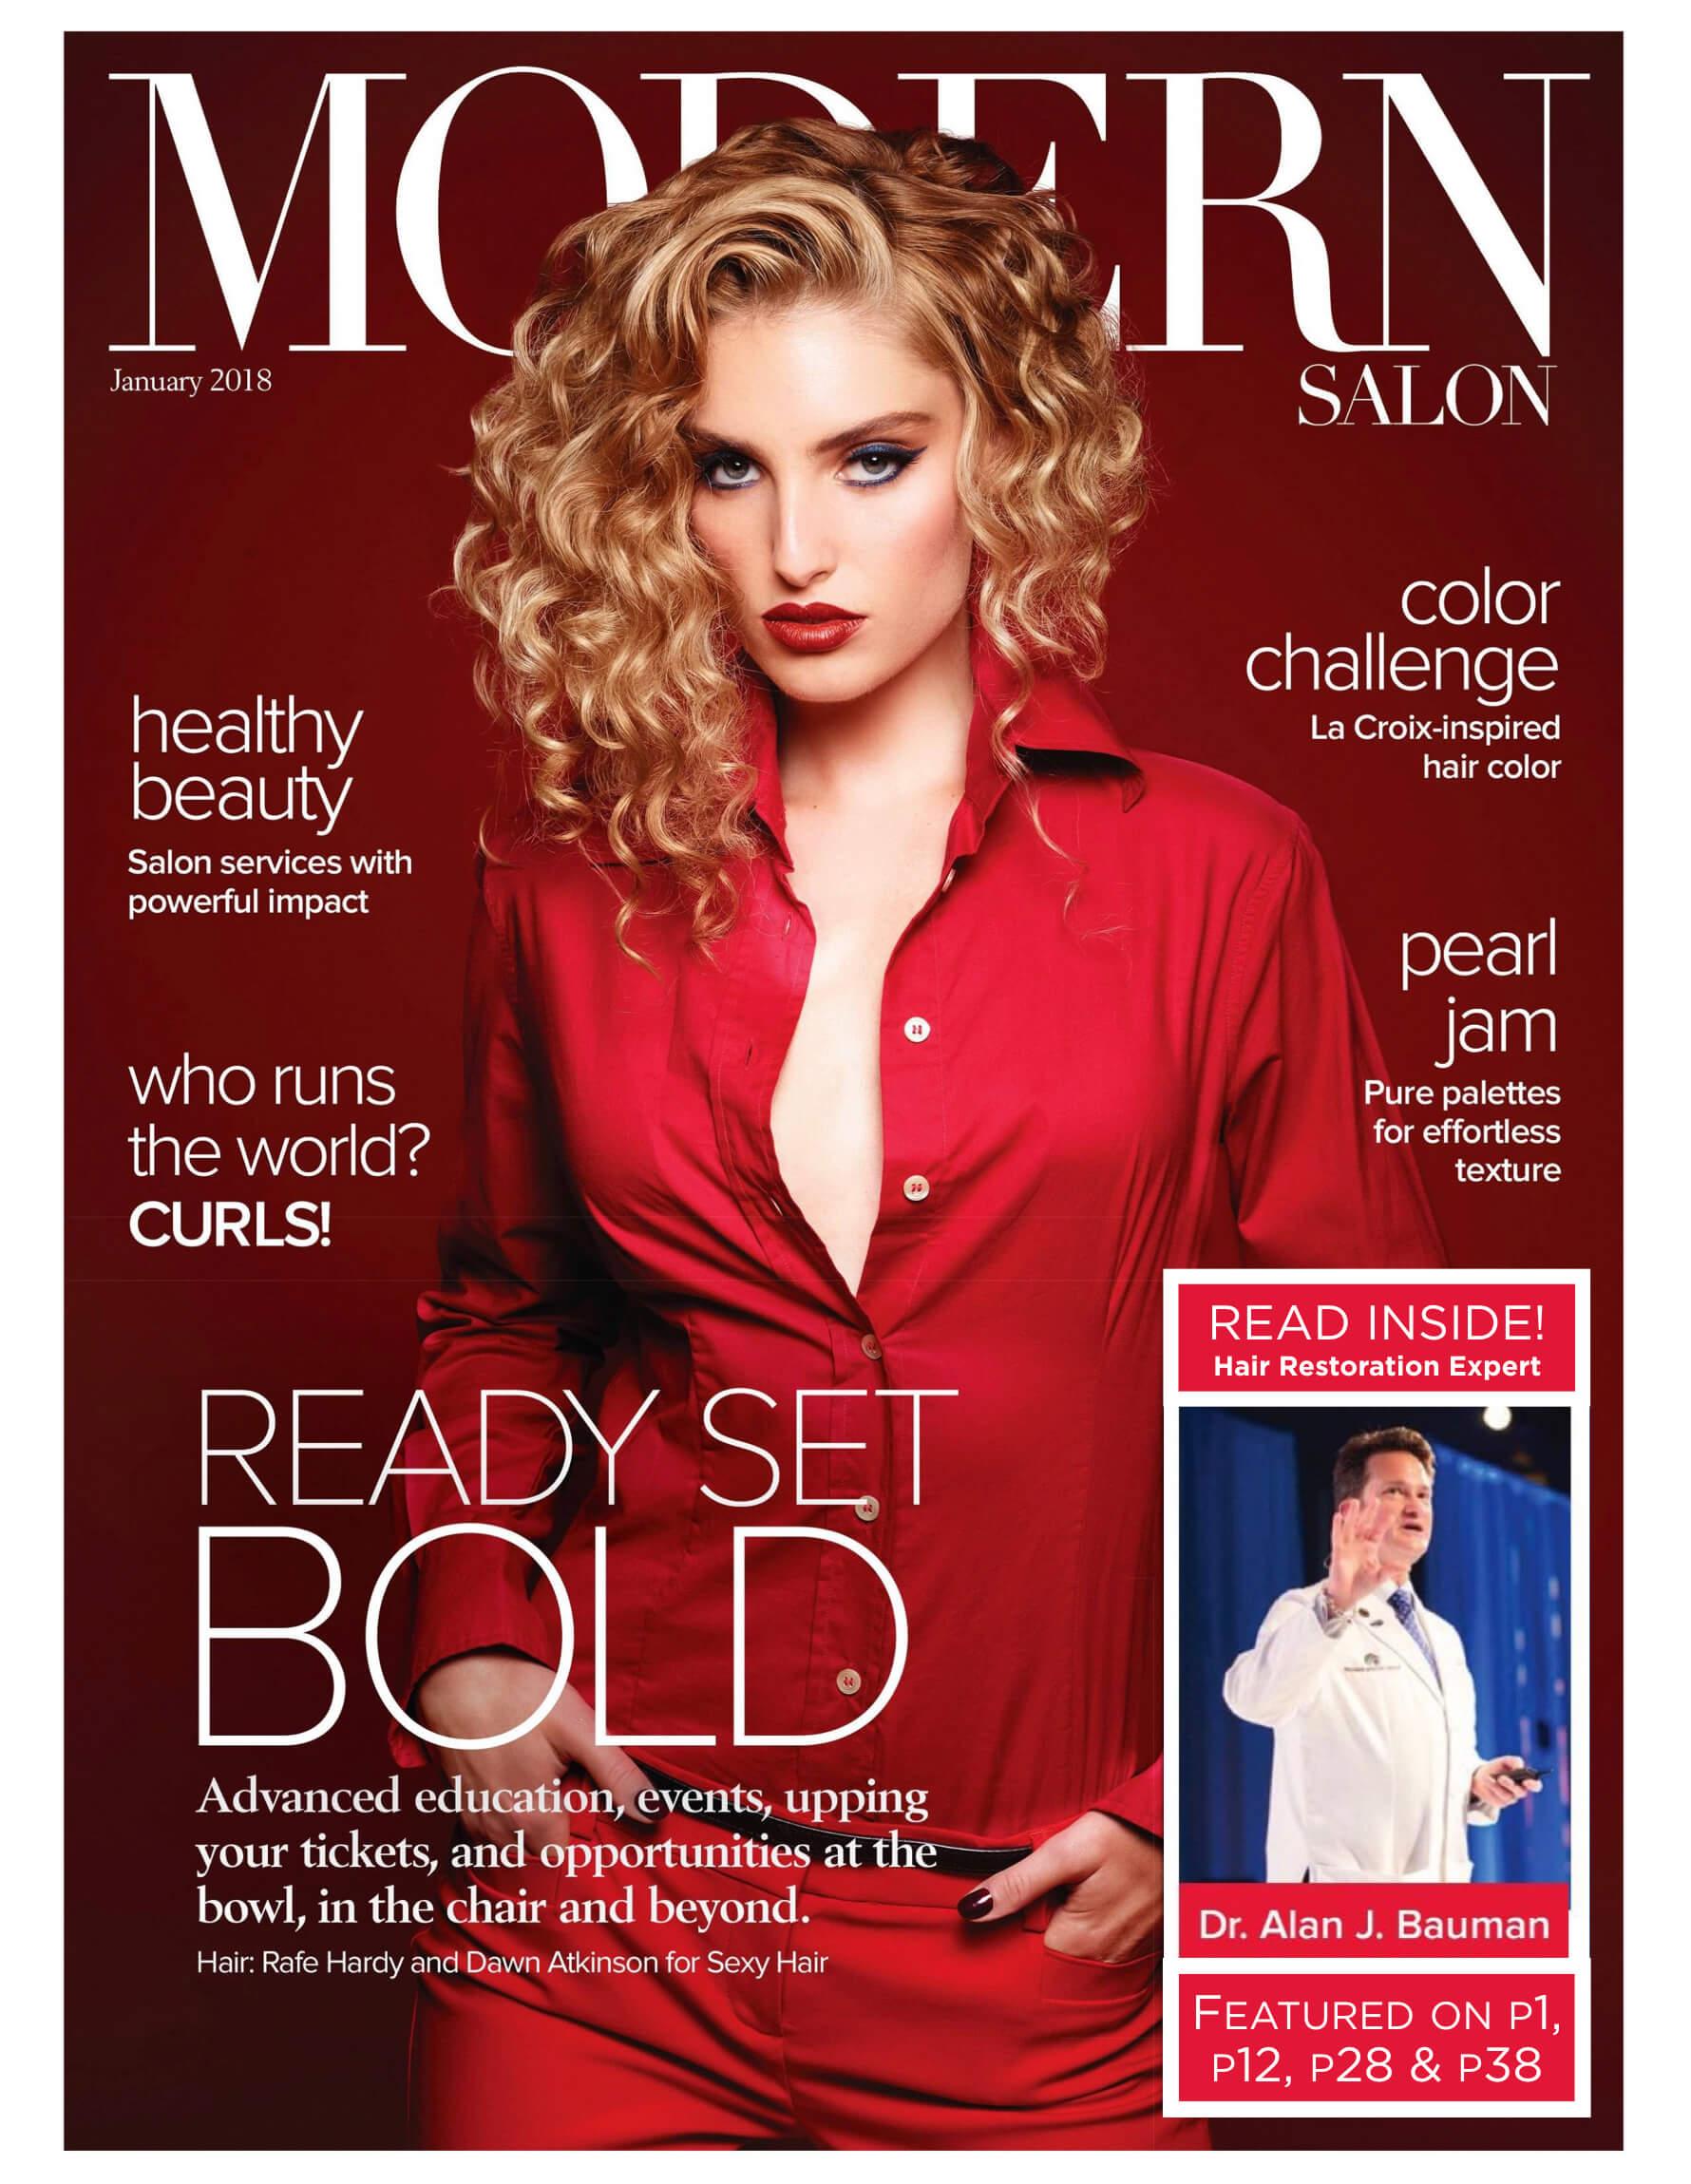 Article Modern Salon Features Hair Restoration Surgeon Dr Alan